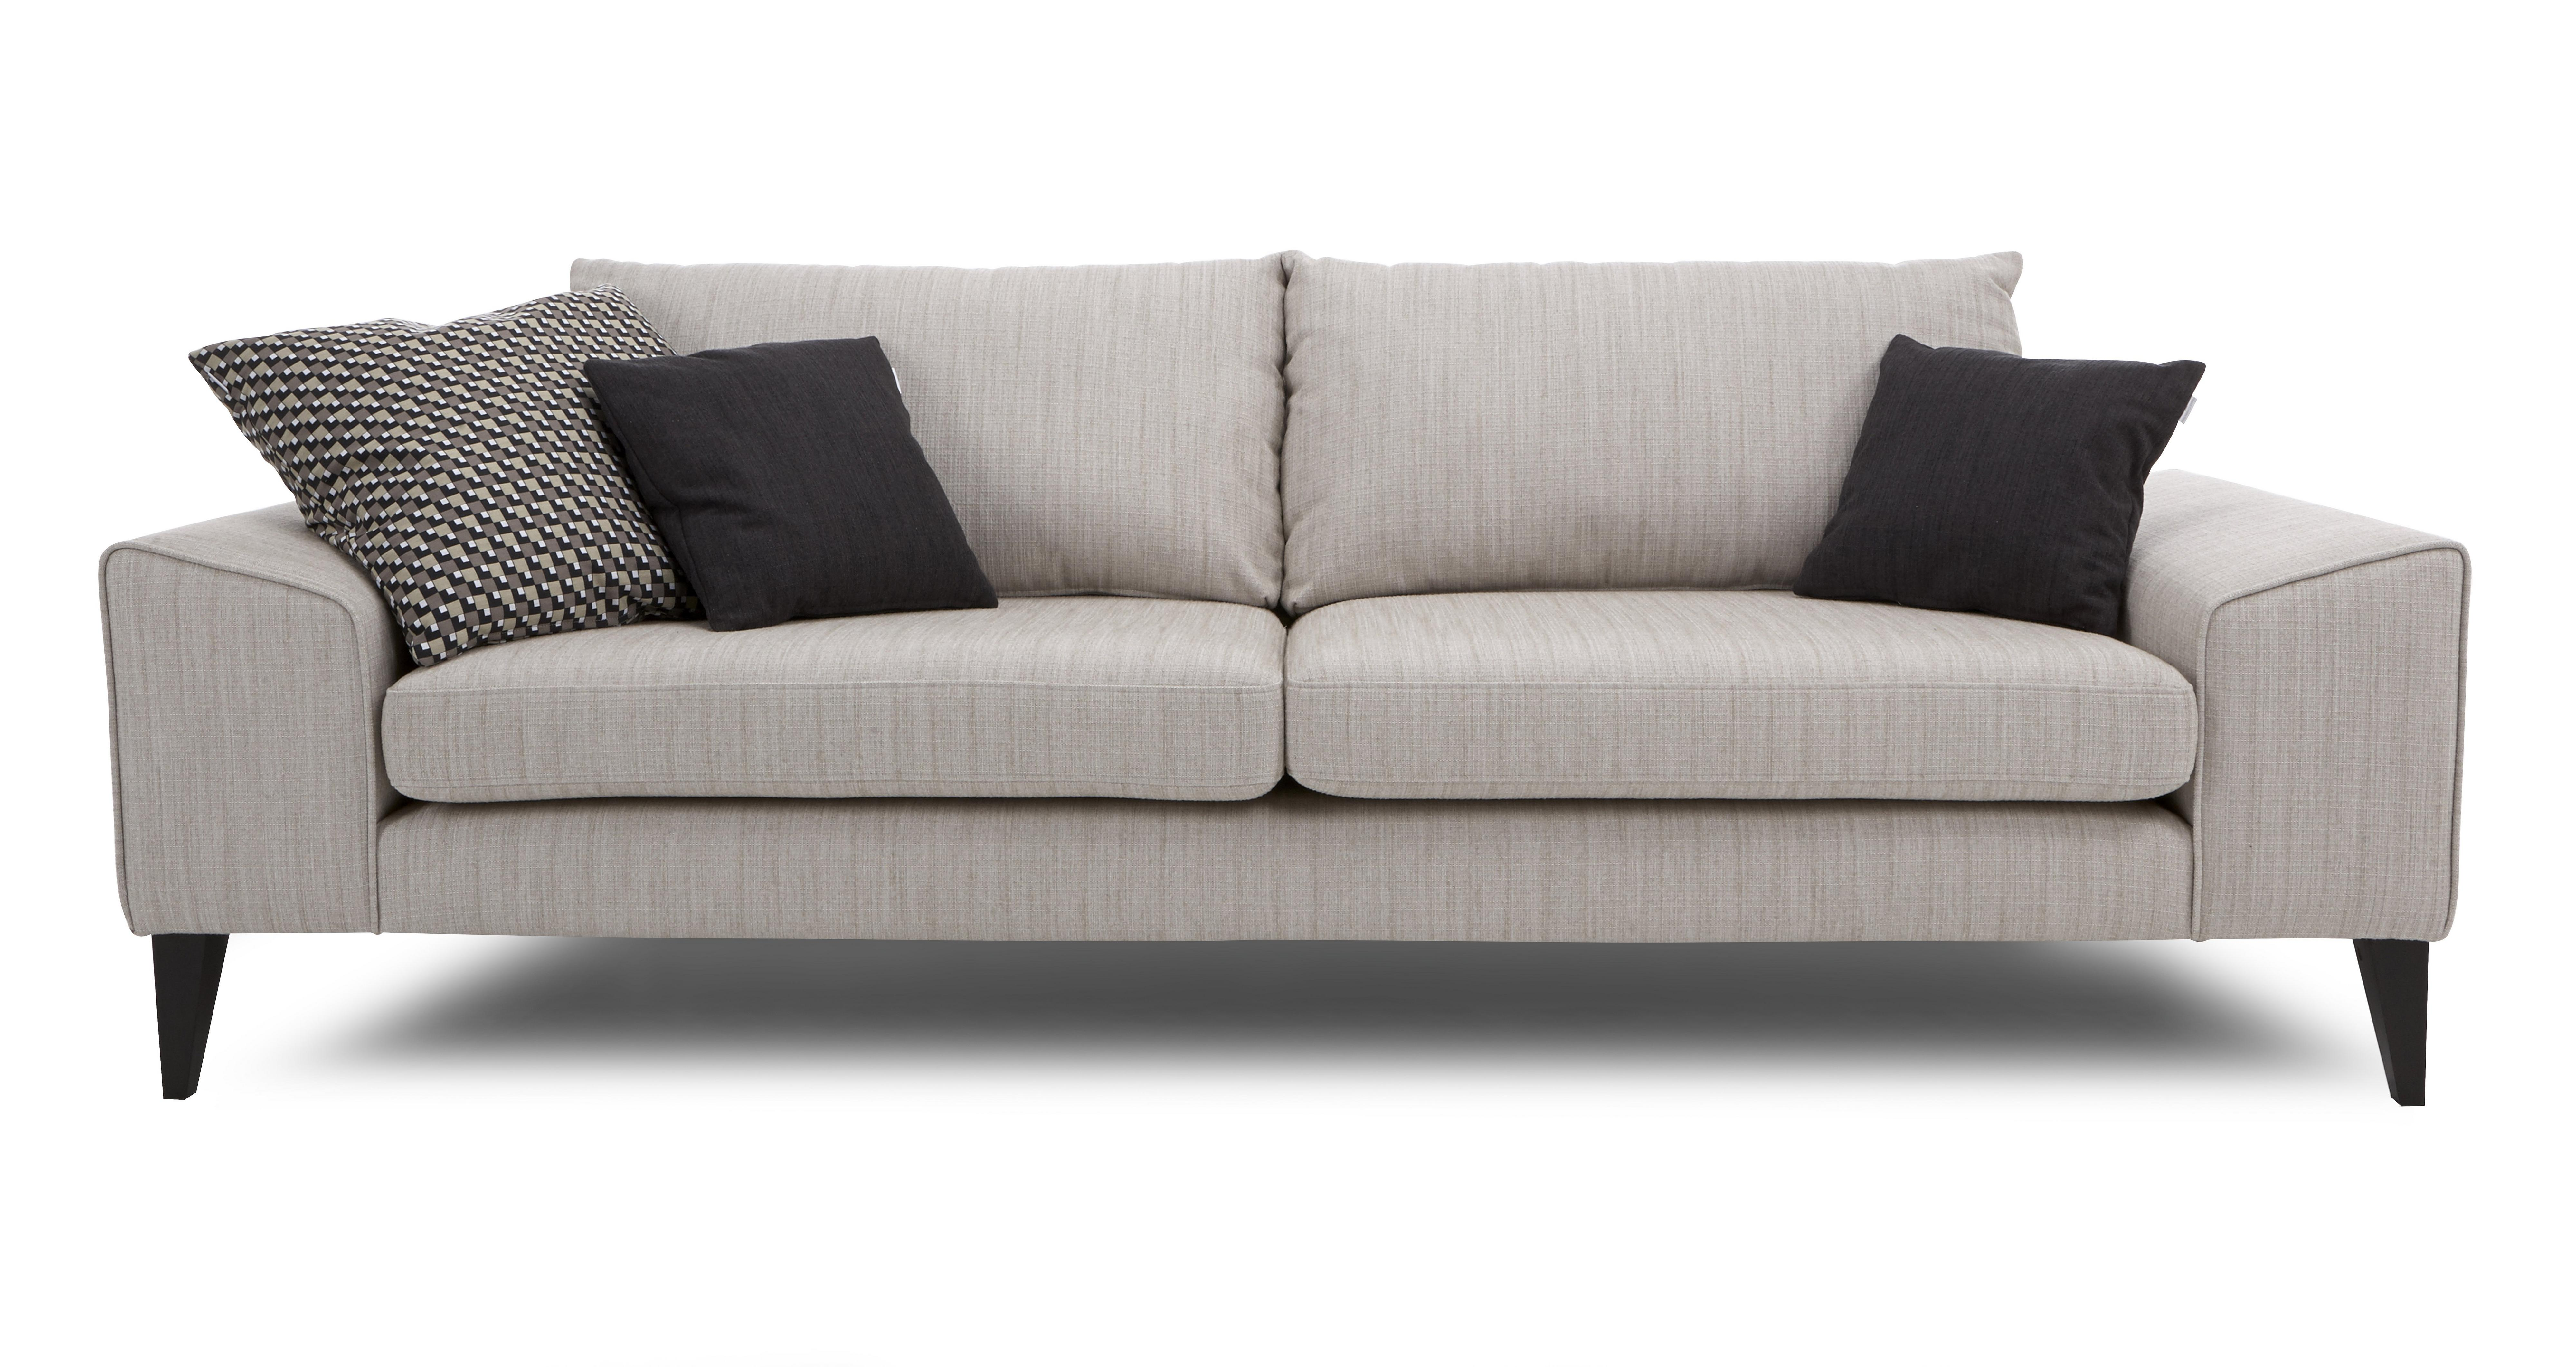 Quartz 4 Seater Sofa Dfs